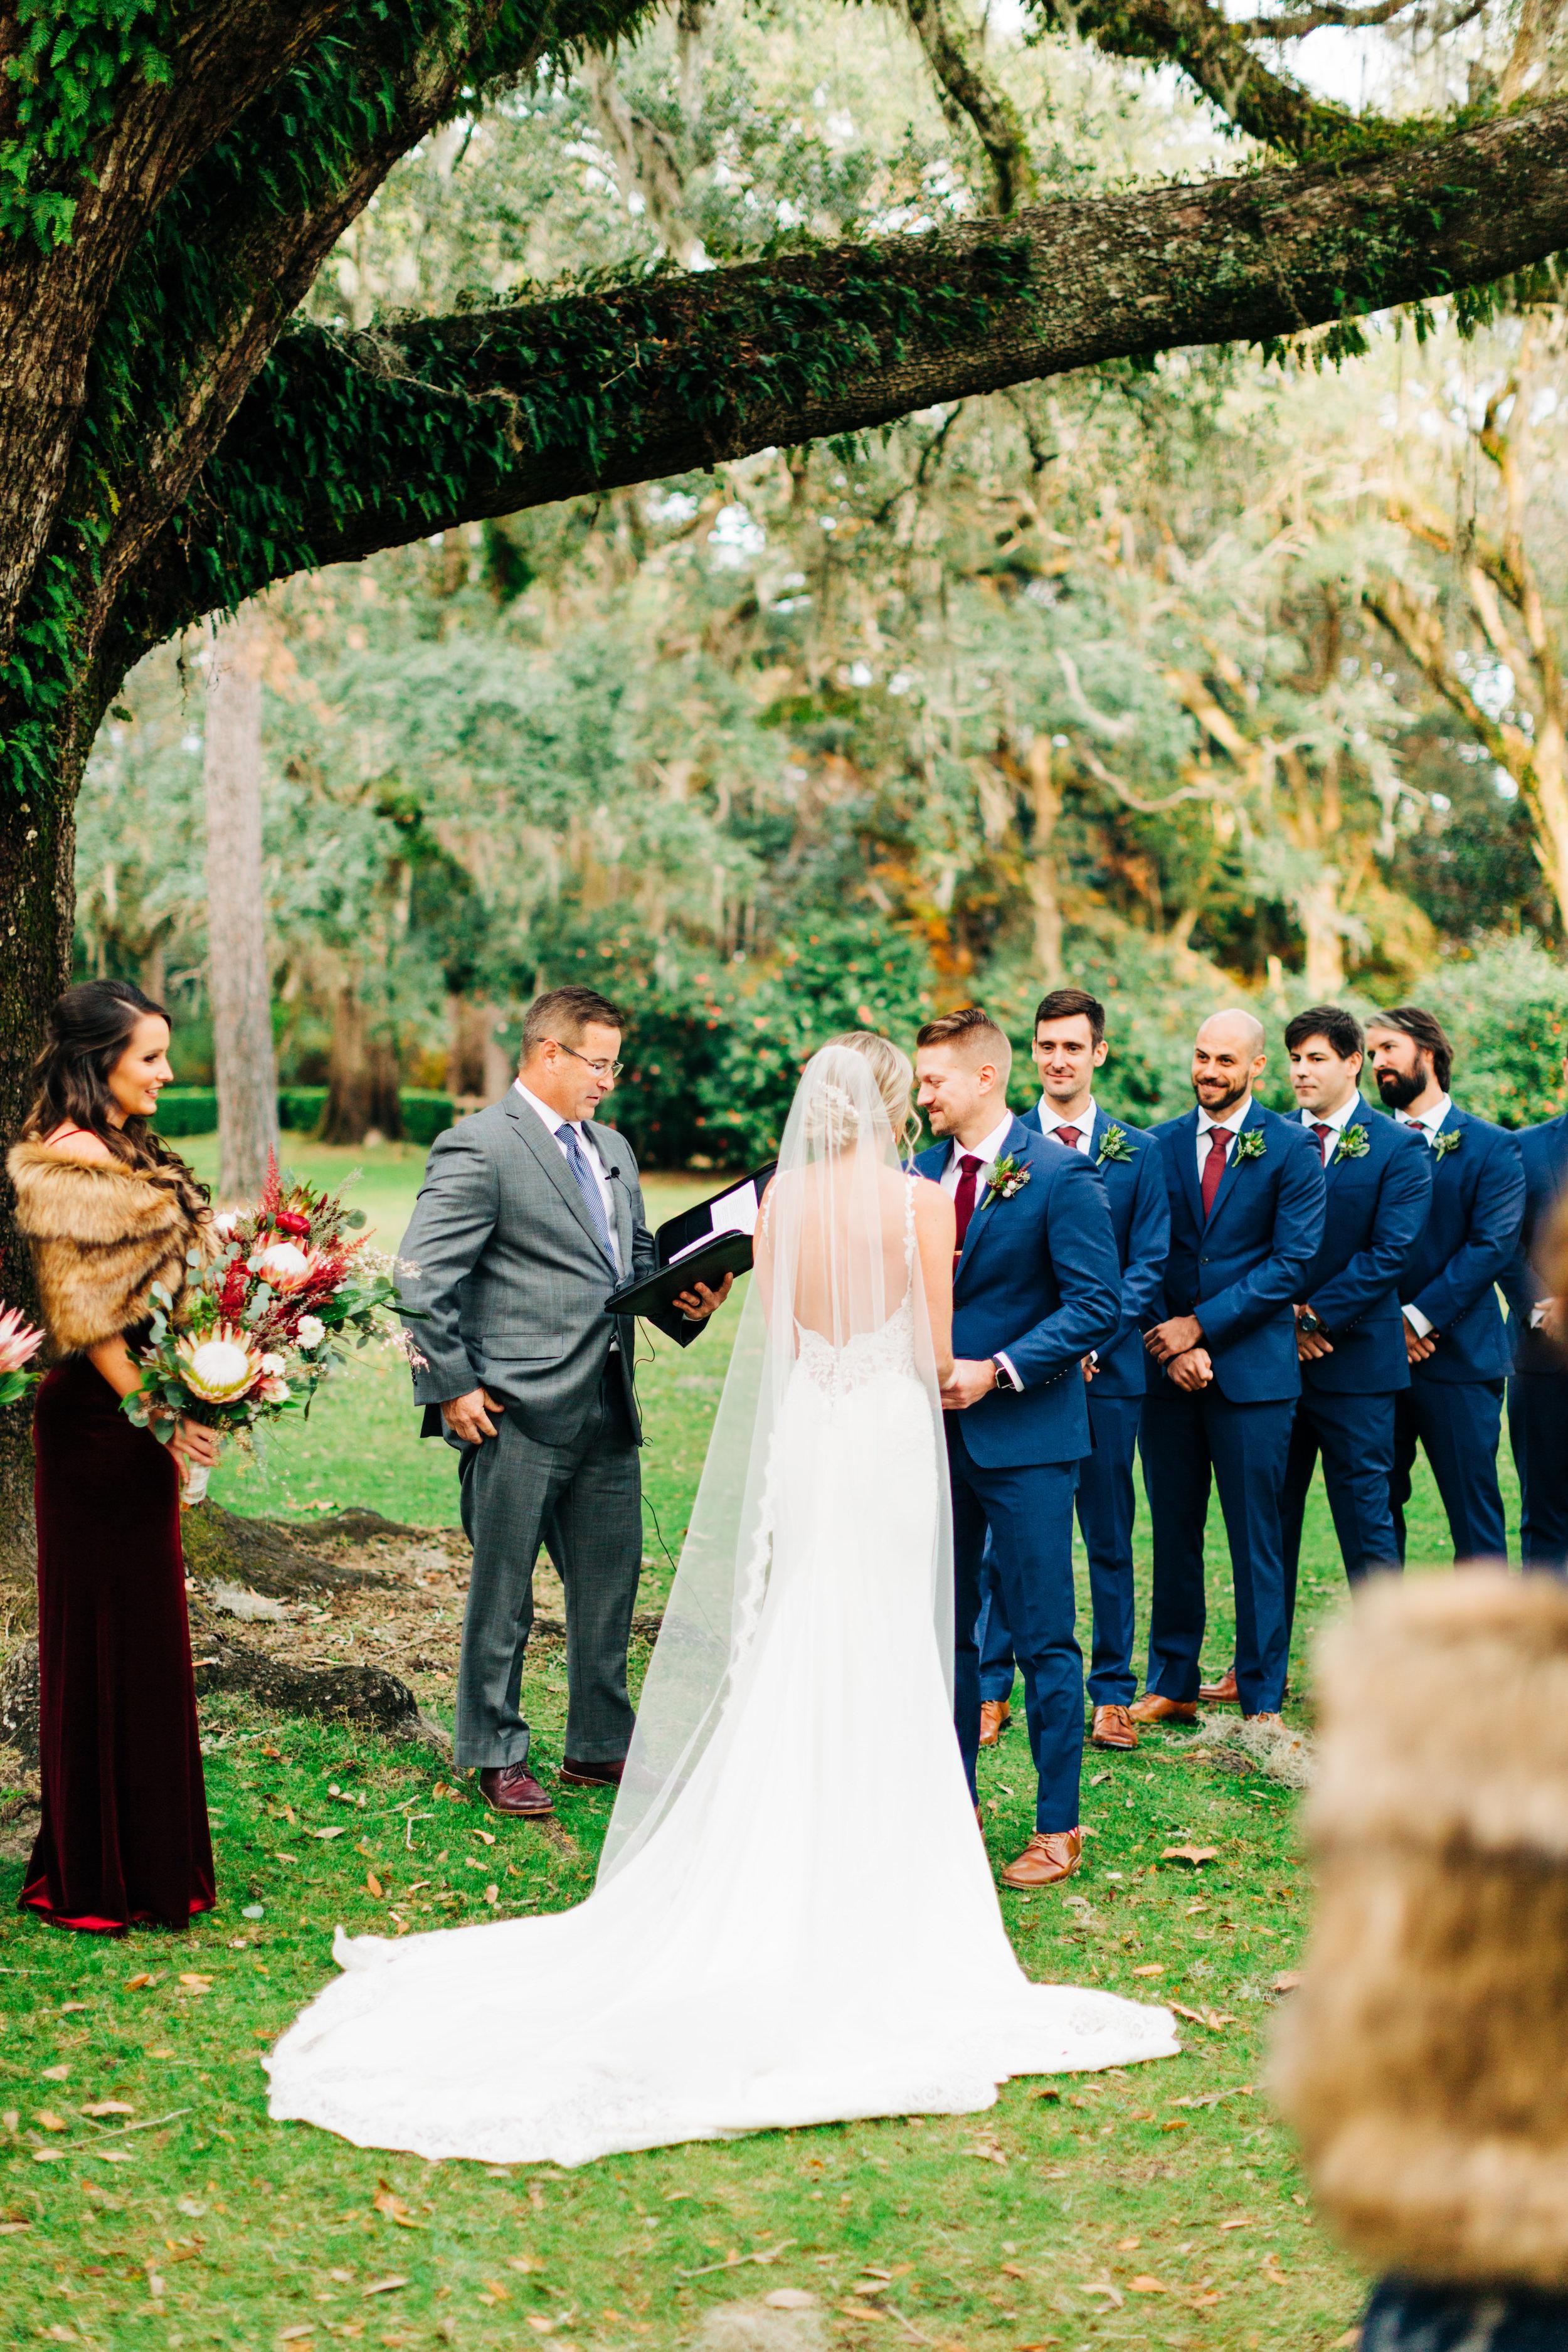 Ricky & Brittney - Ceremony - Jake & Katie Photography_083.jpg